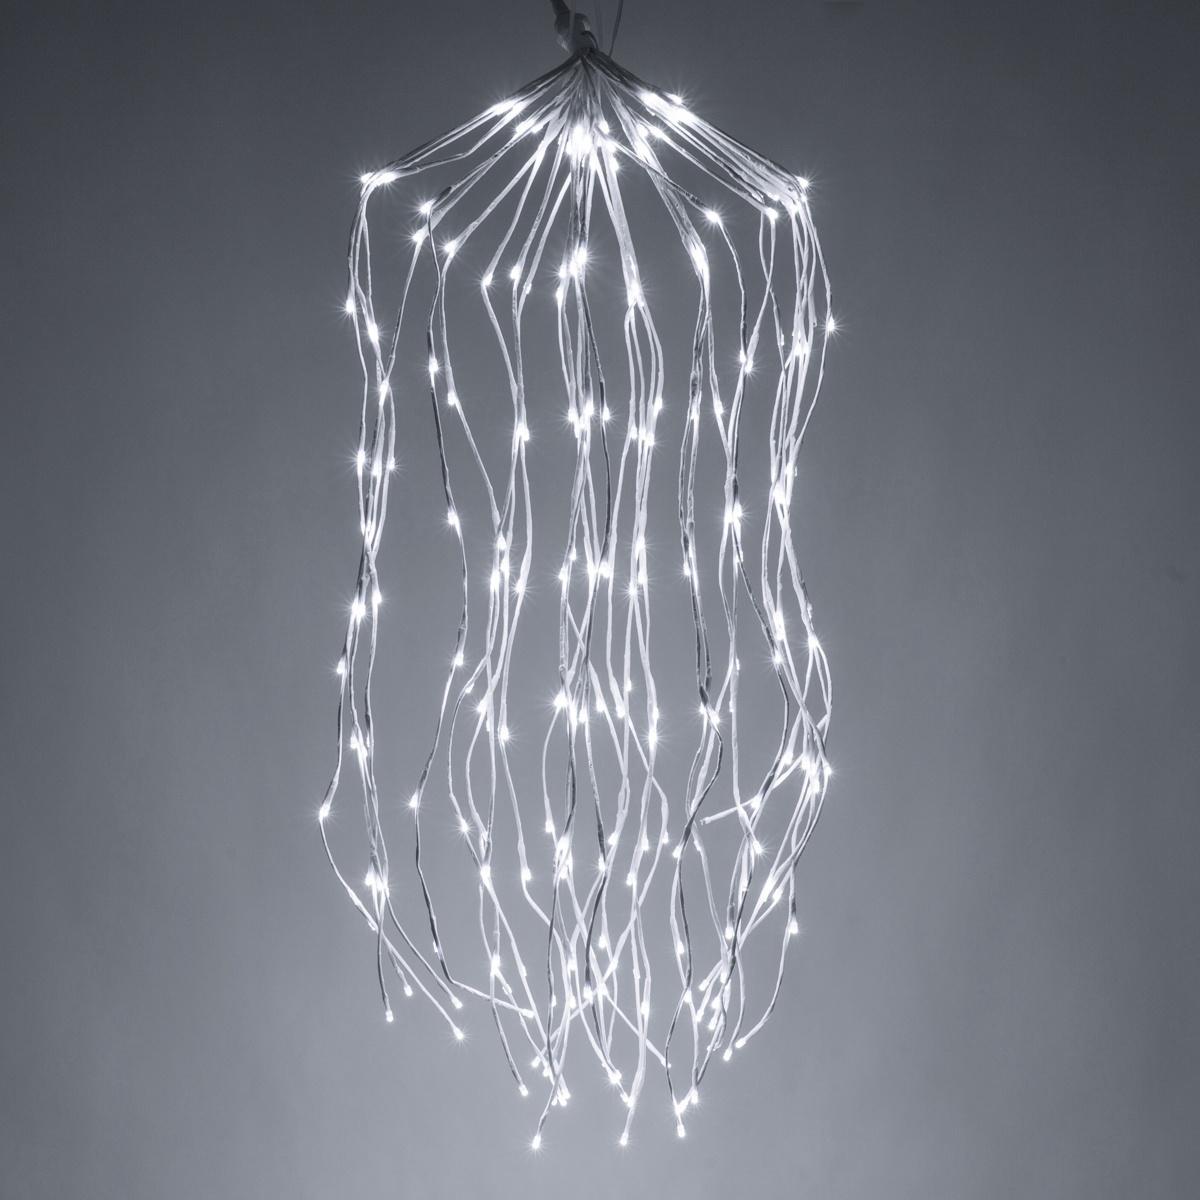 Led Cool White Christmas Tree Lights